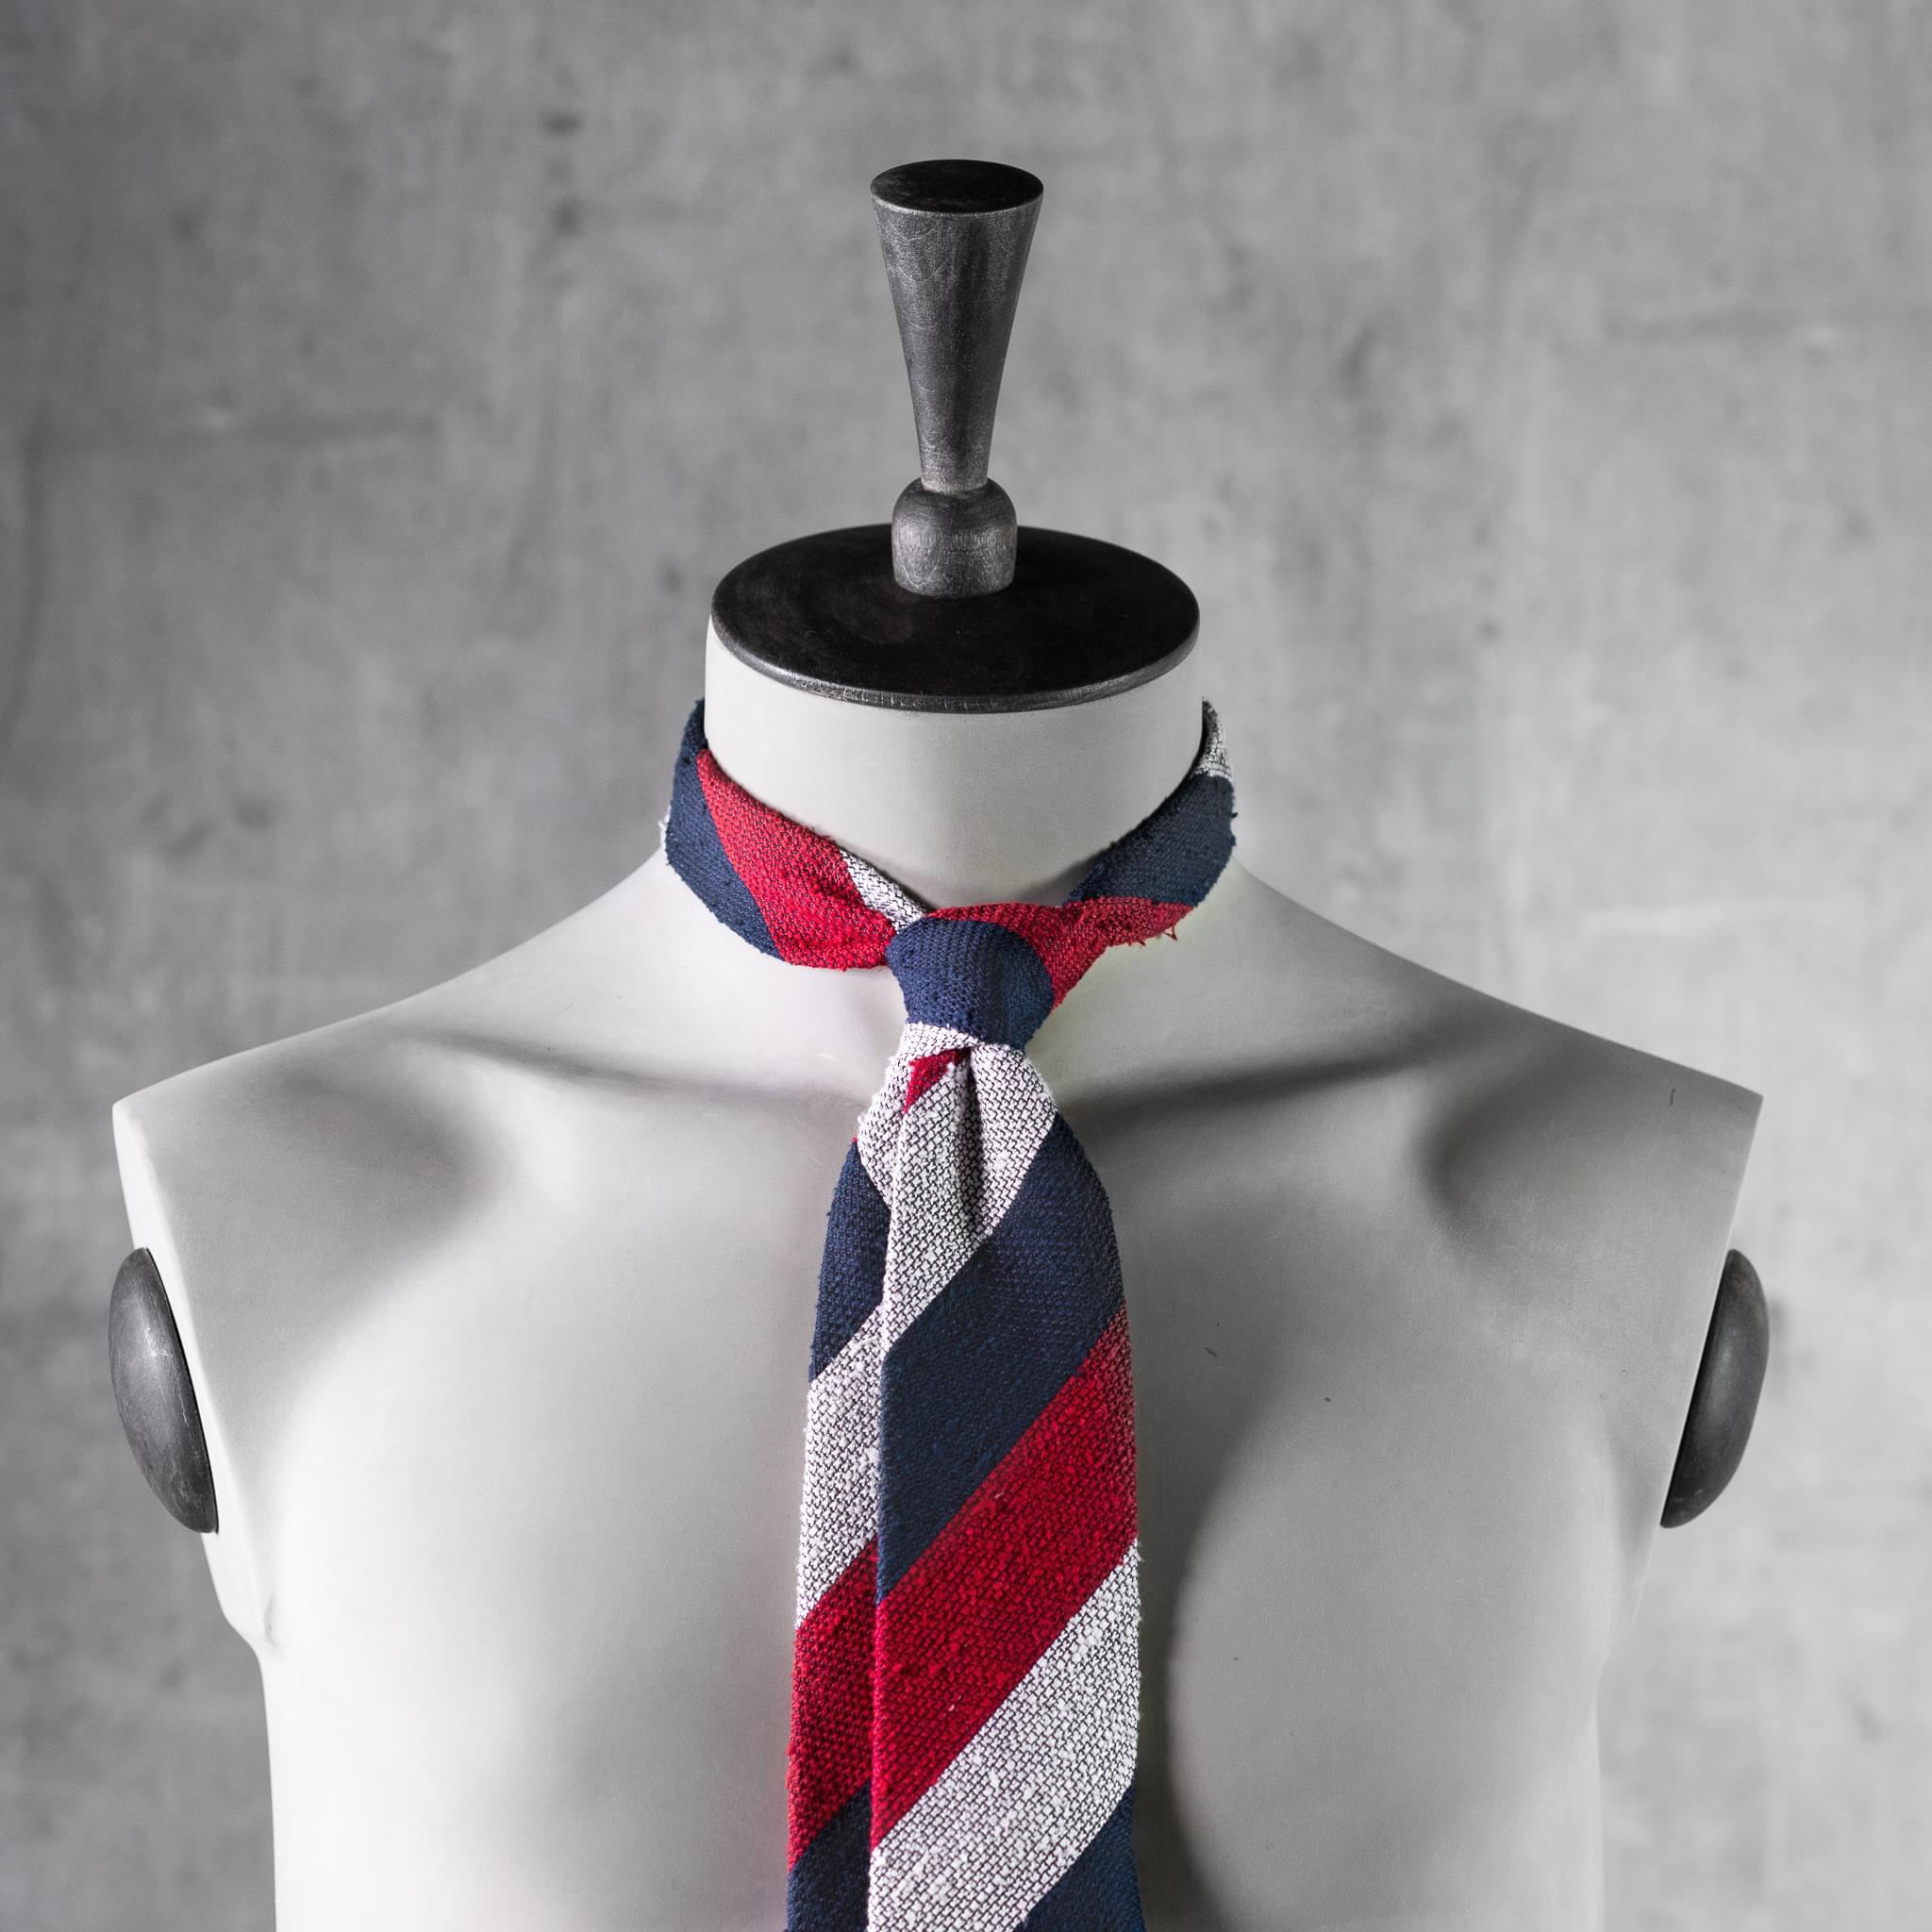 SHANTUNG-0524-Tie-Initials-Corbata-Iniciales-The-Seelk-3